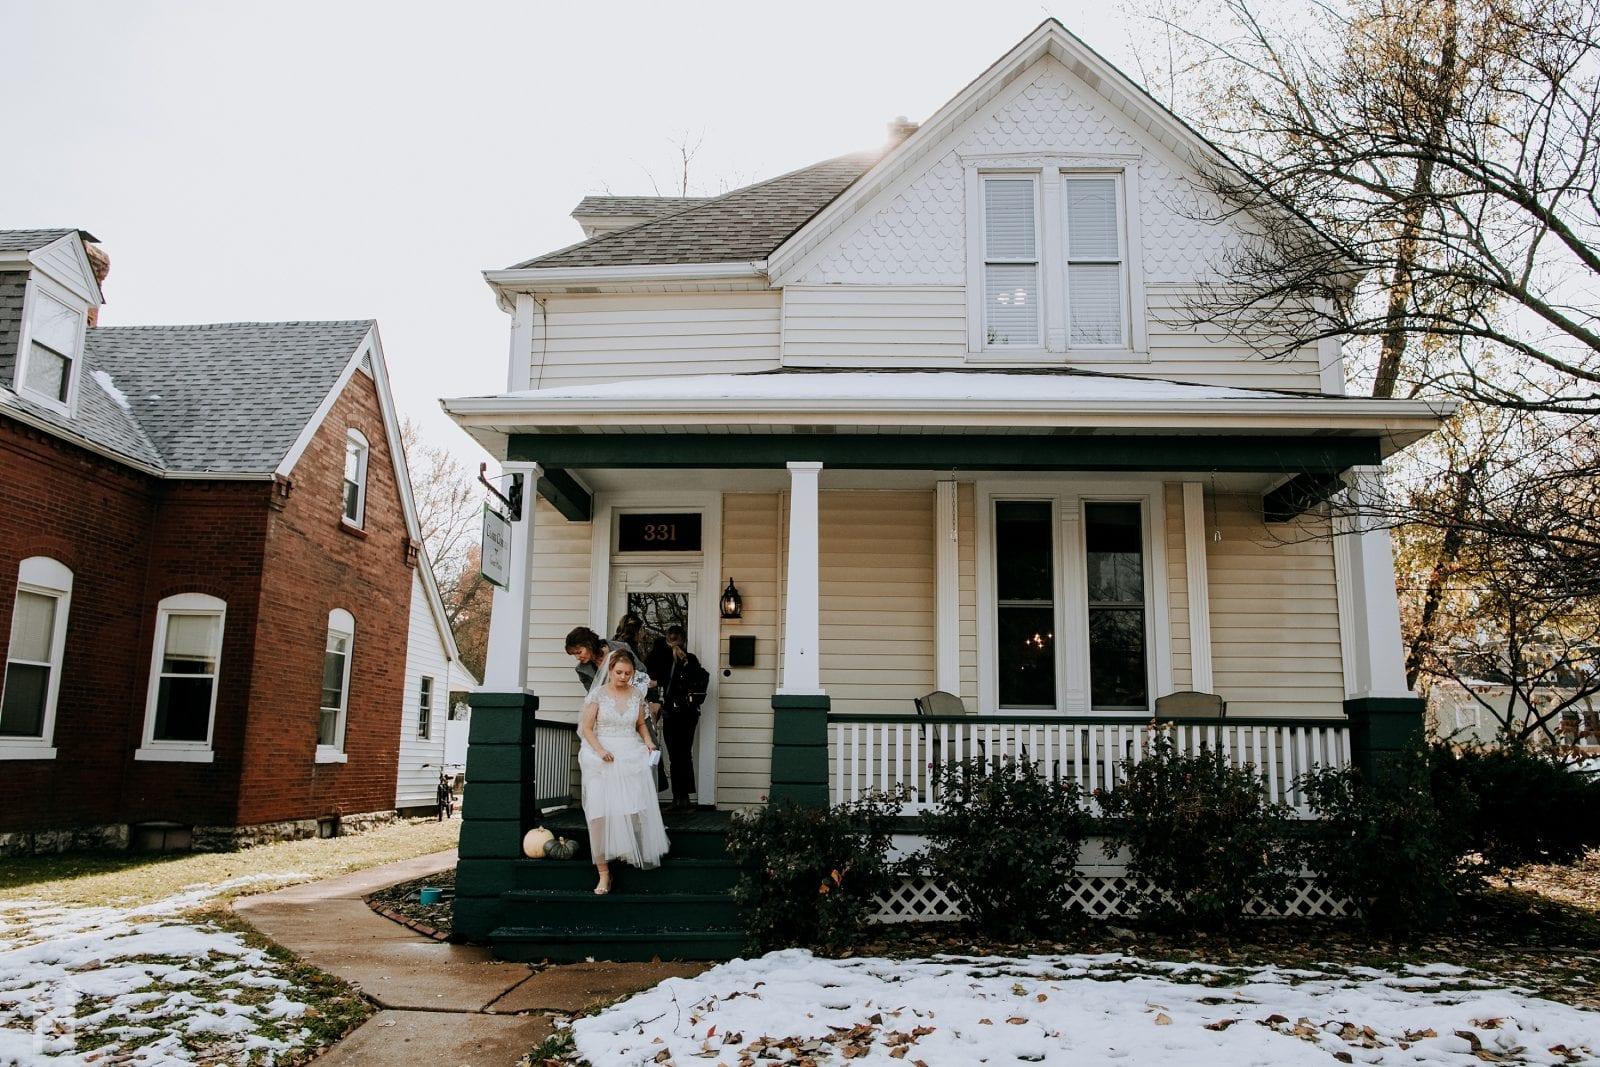 clark corner guest house in st. charles, Missouri